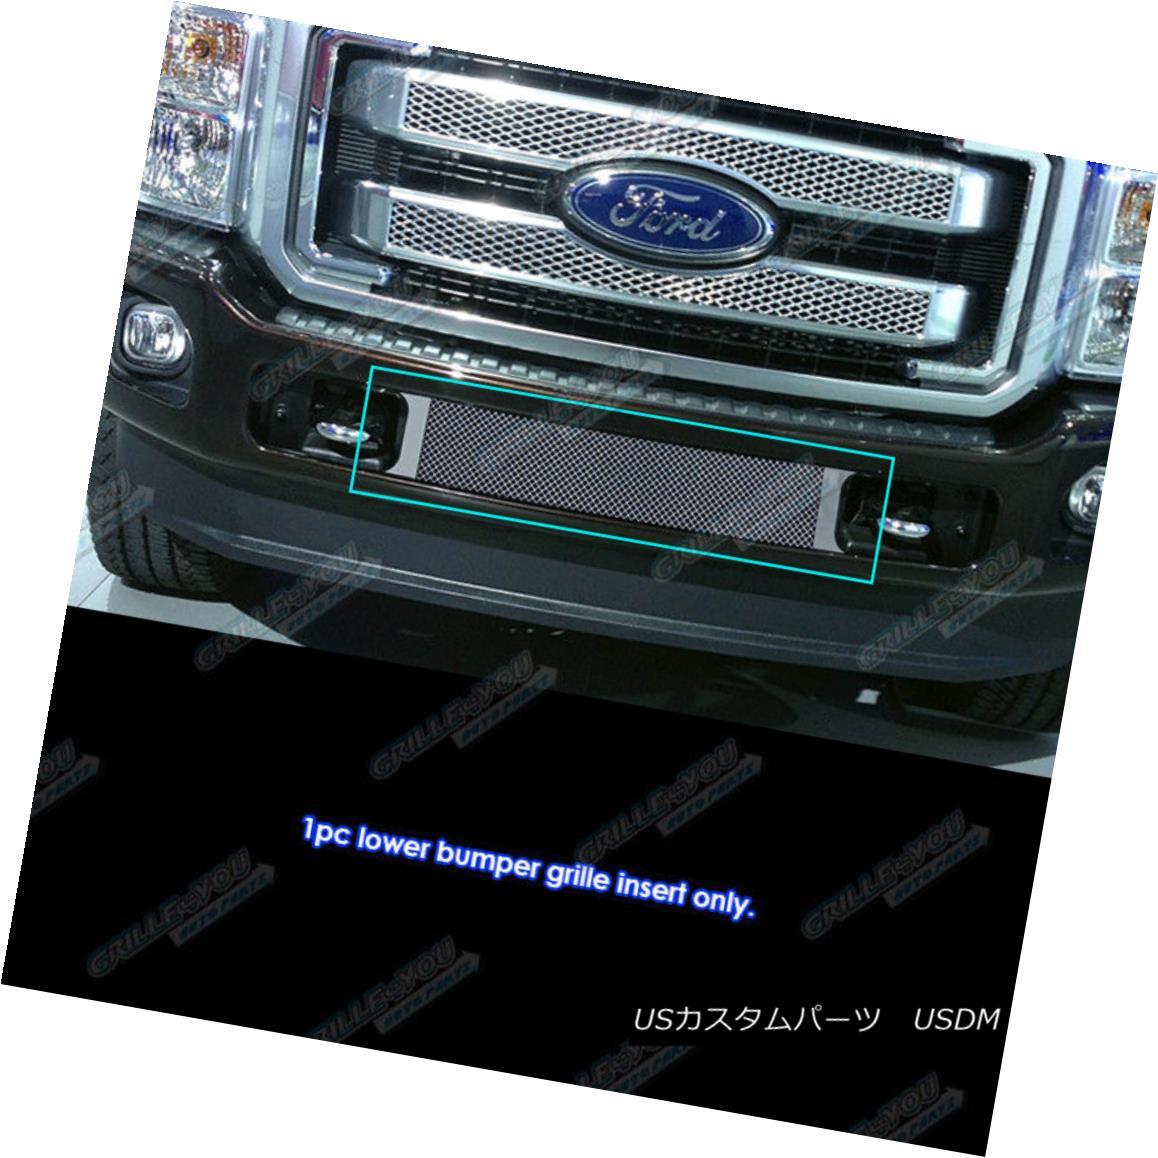 USグリル For 2011-2015 Ford F-250/350/450 SD No Frame Chrome Bumper Mesh Grille 2011-2015 Ford F-250/350/450 SDフレームなしクロムバンパーメッシュグリル